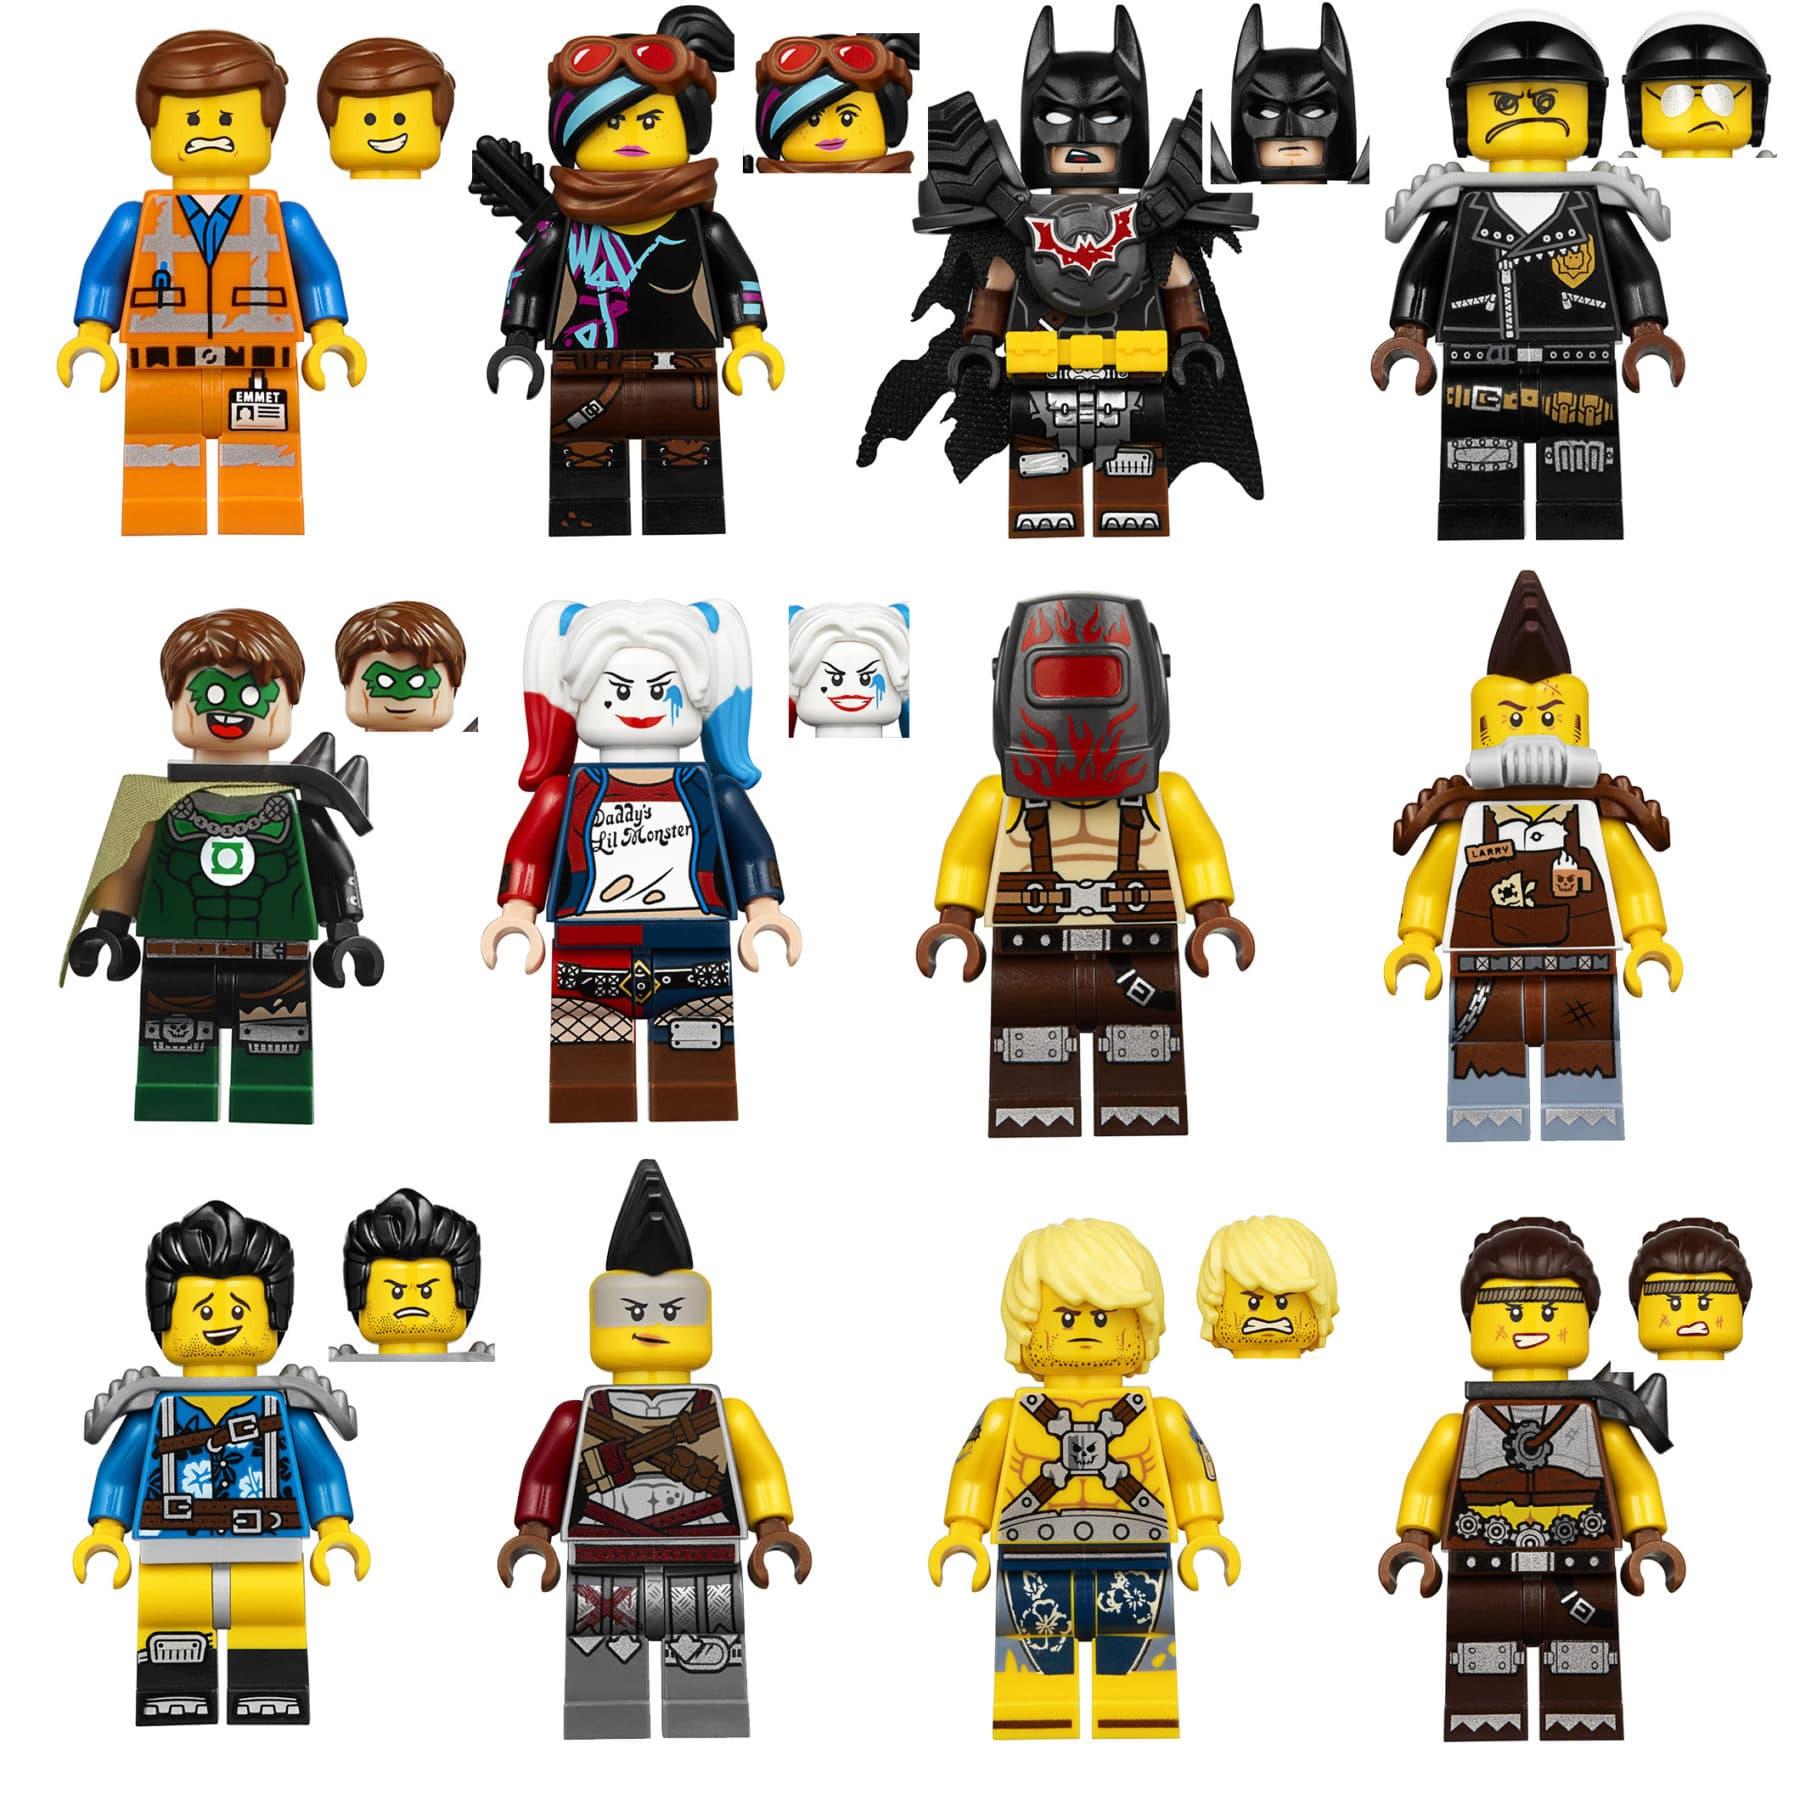 LEGO 70840 Apocalypseburg Minifiguren Übersicht